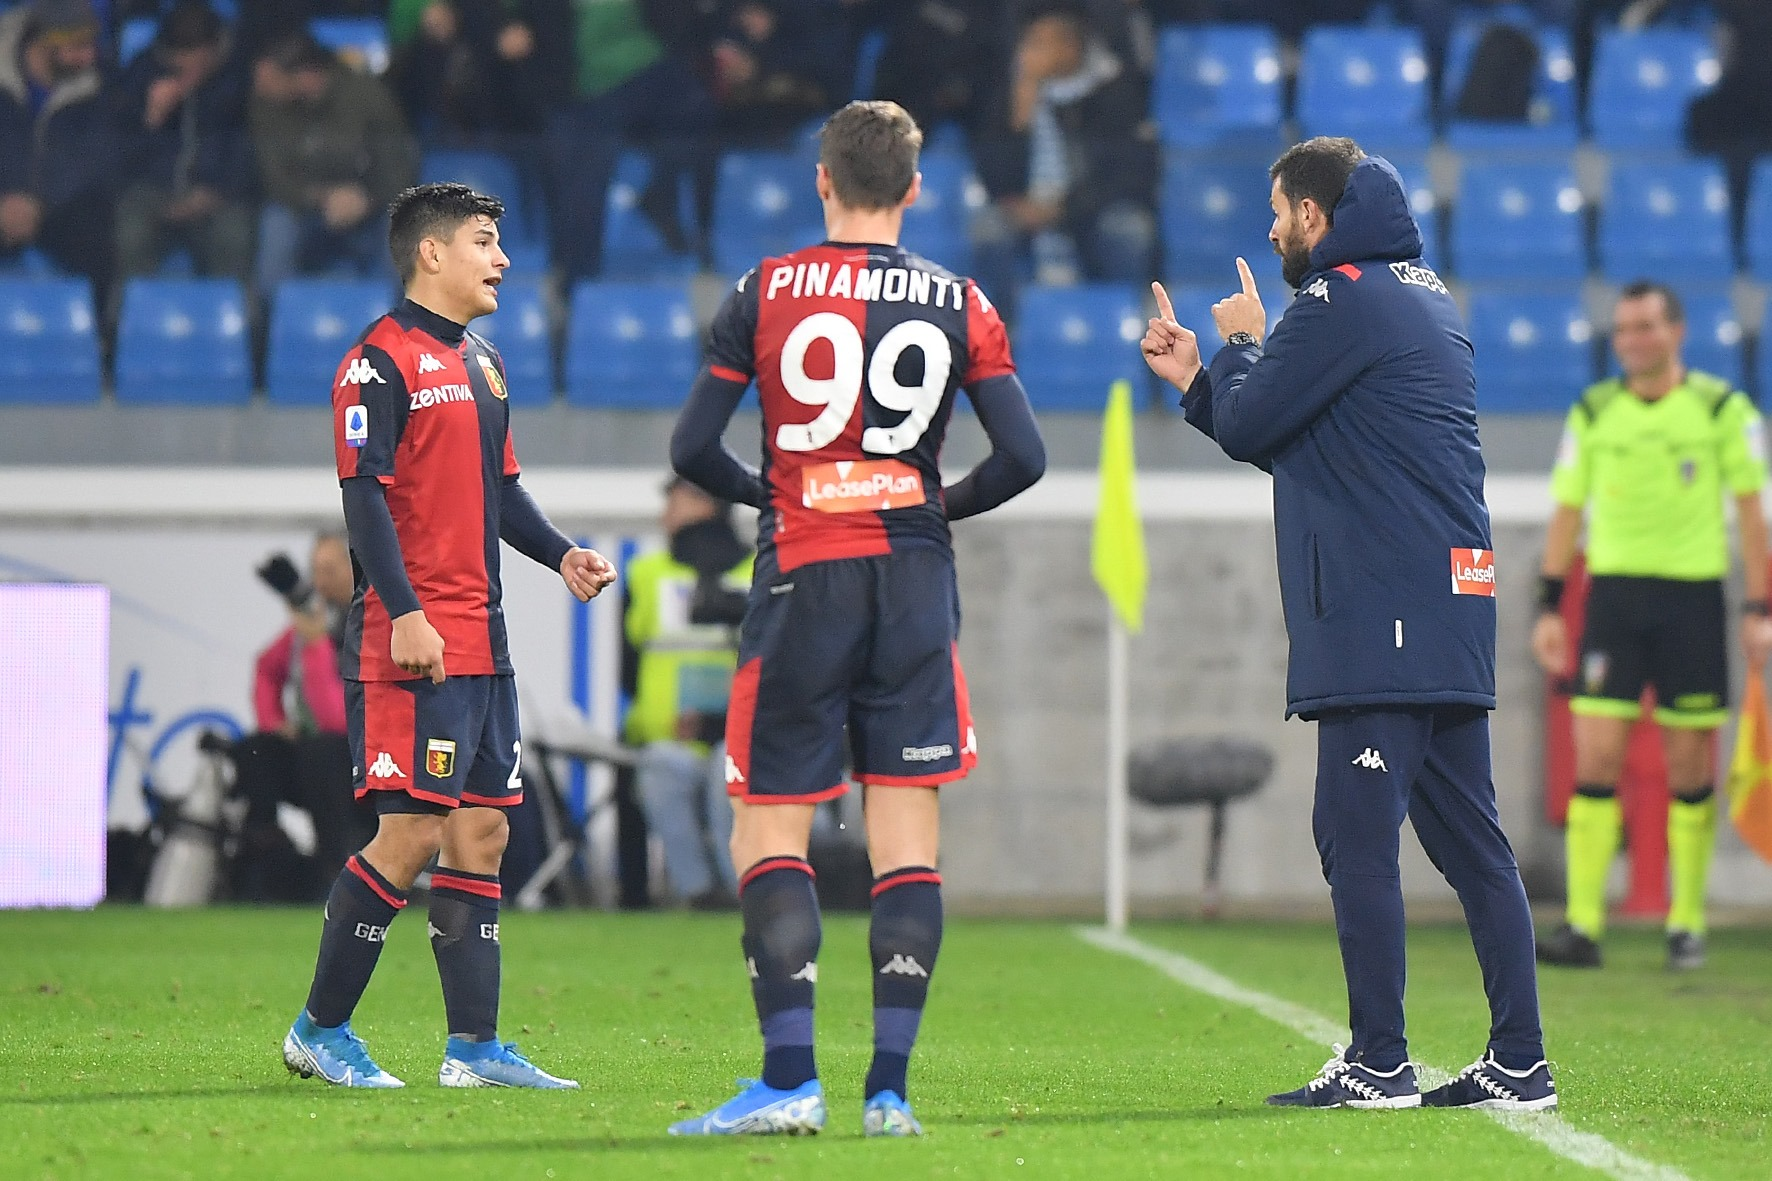 Genoa-Torino, Mazzarri: